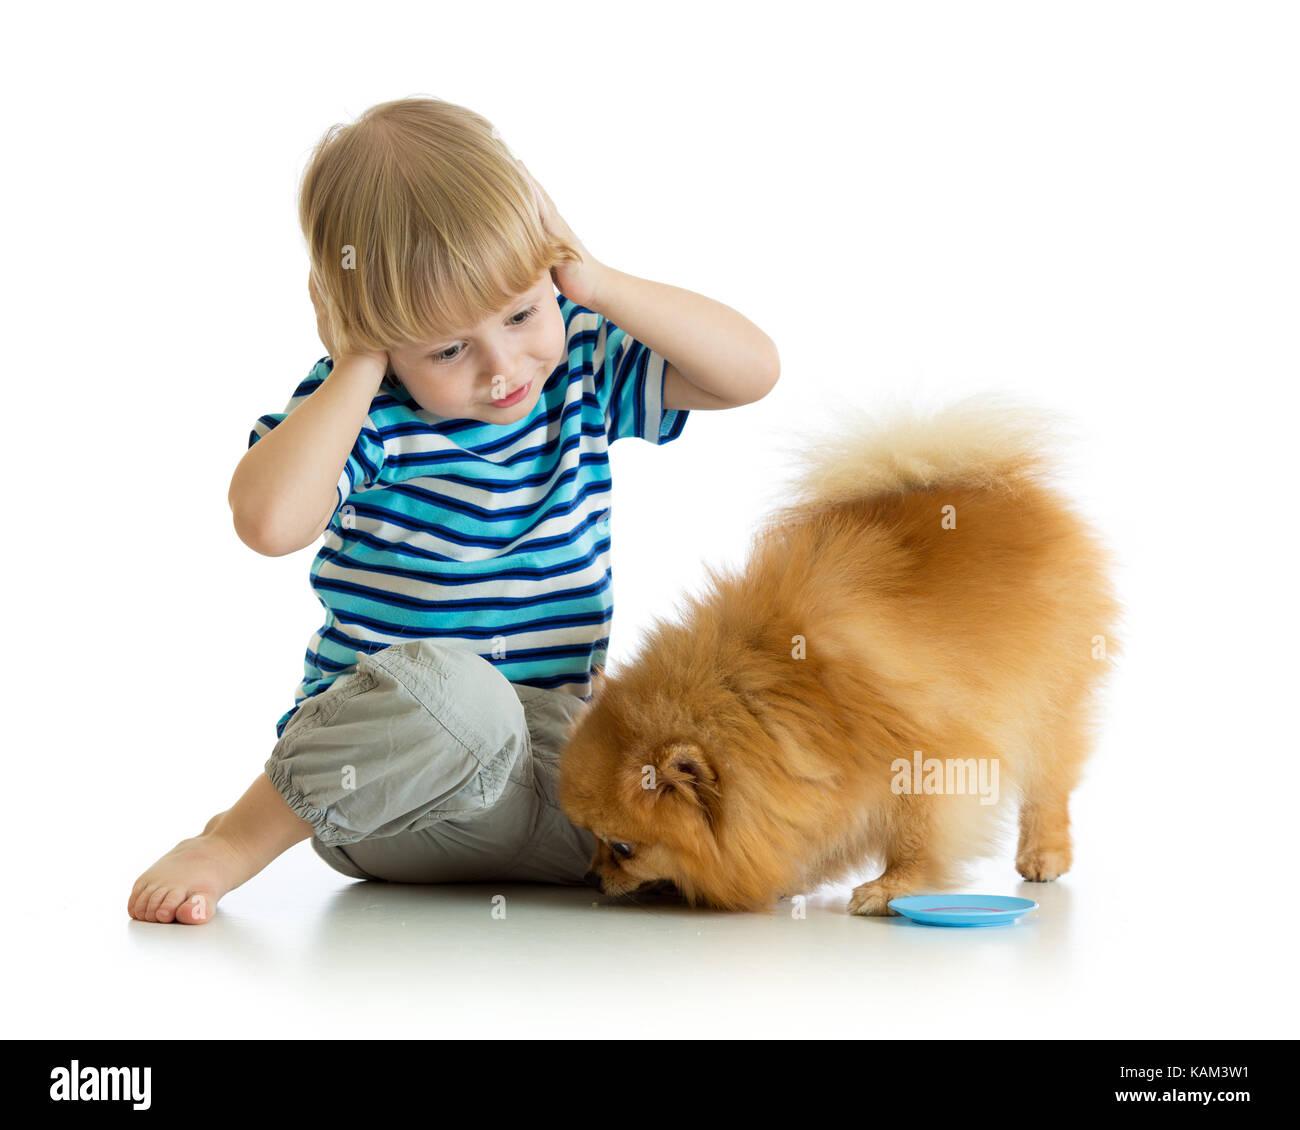 surprised child boy with dog - Stock Image